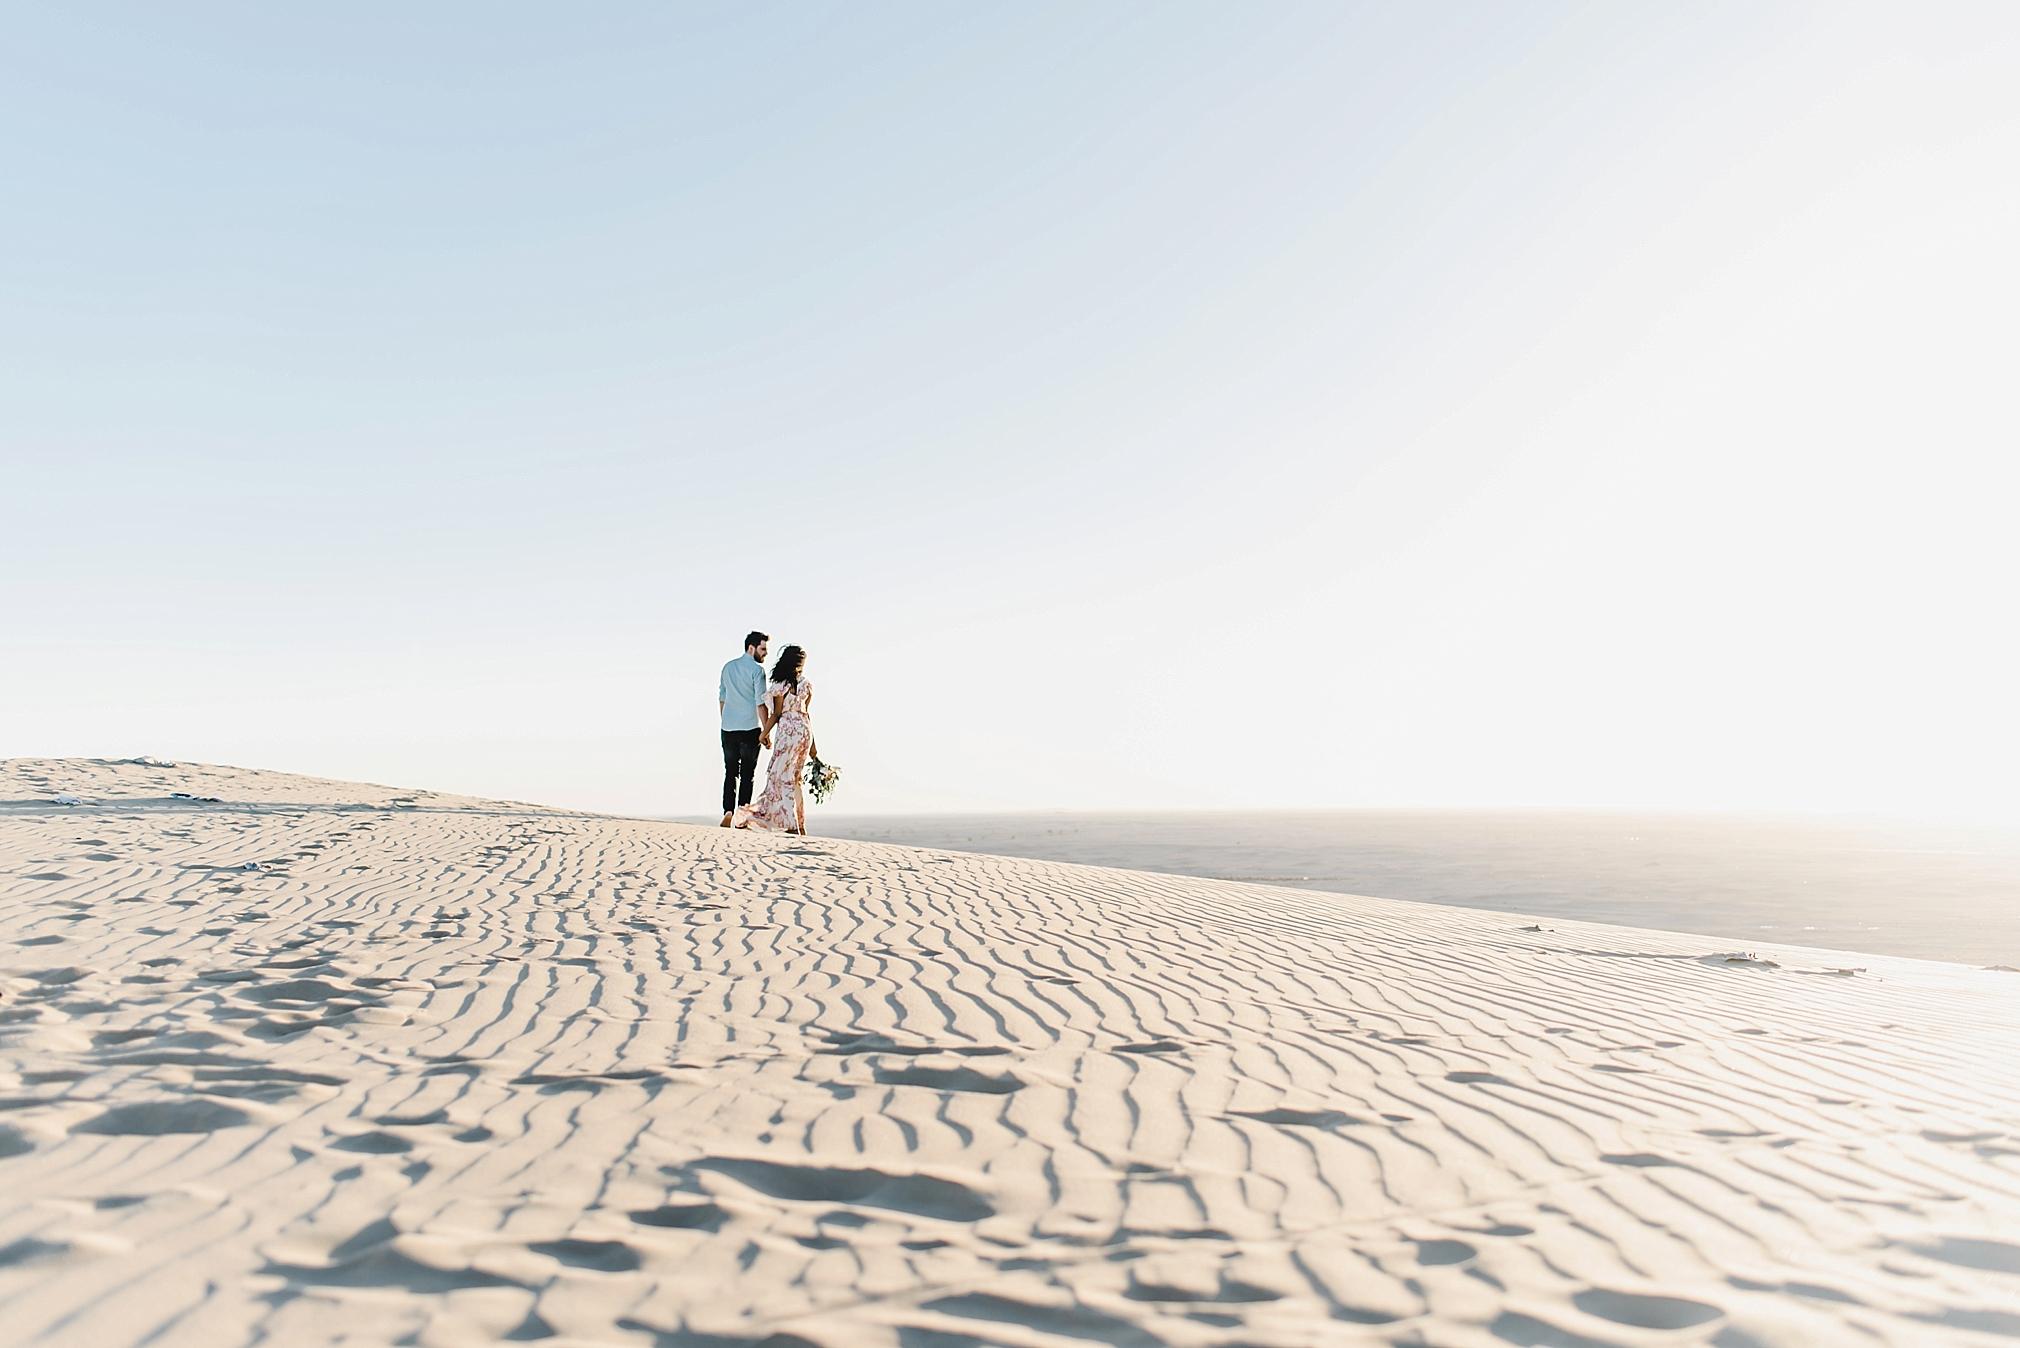 Singing Sand Dunes Desert Love Shoot   Ali and Batoul Photography_0047.jpg